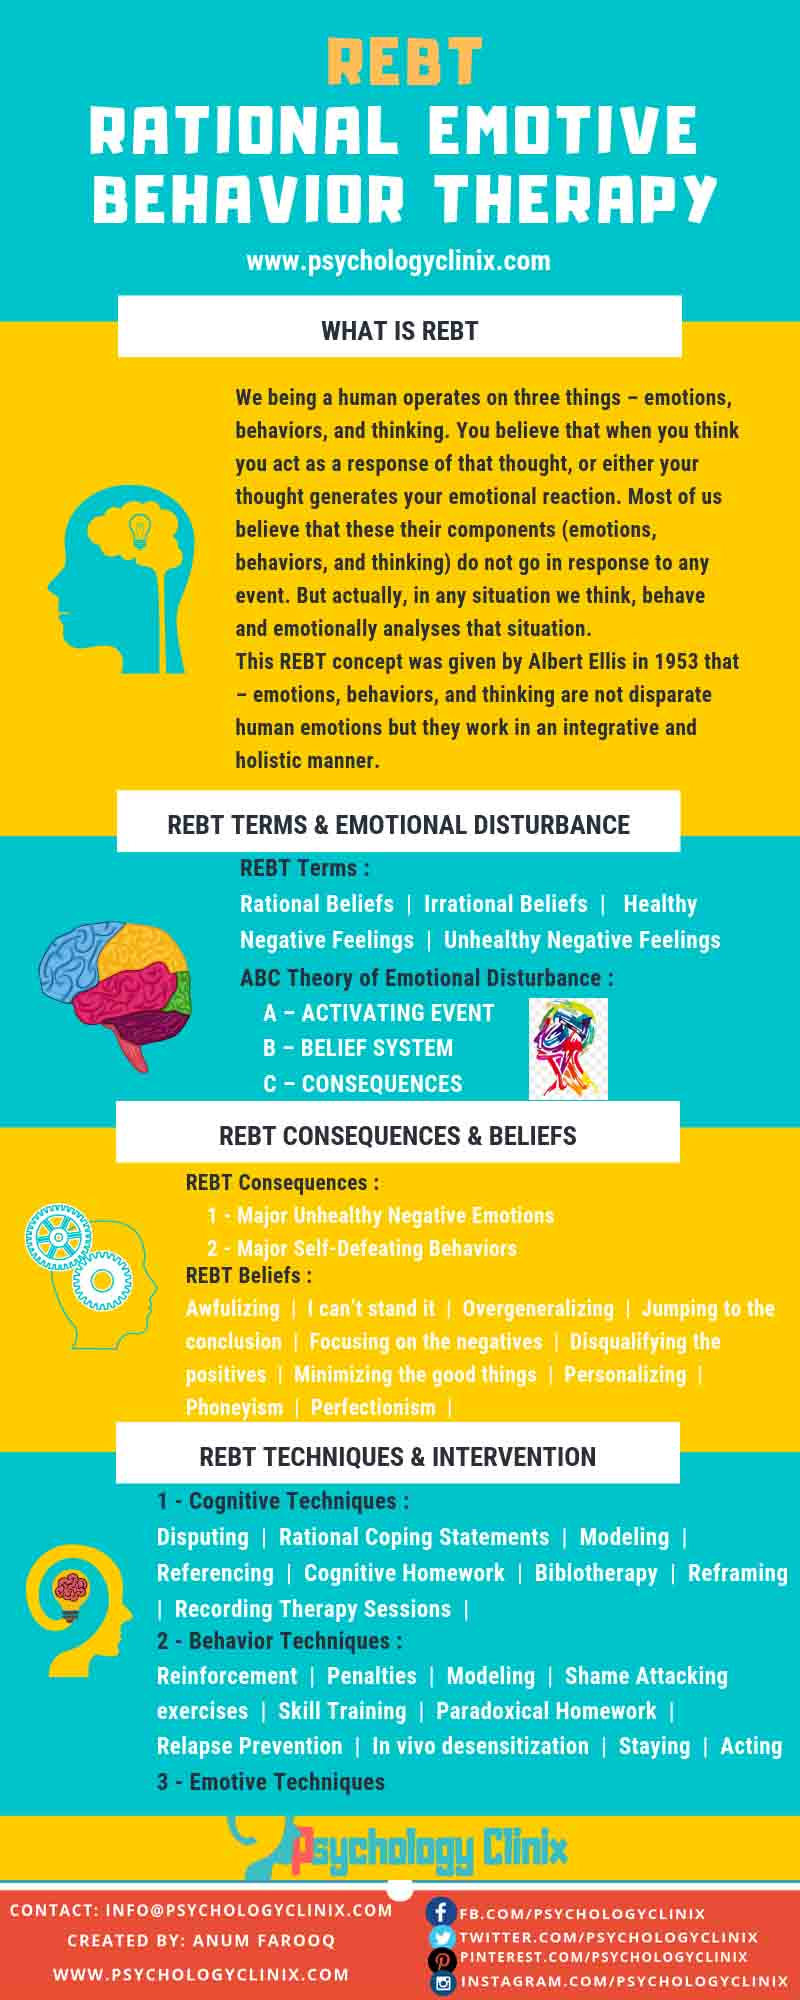 REBT - Rational Emotive Behavior Therapy - PsychologyClinix.com